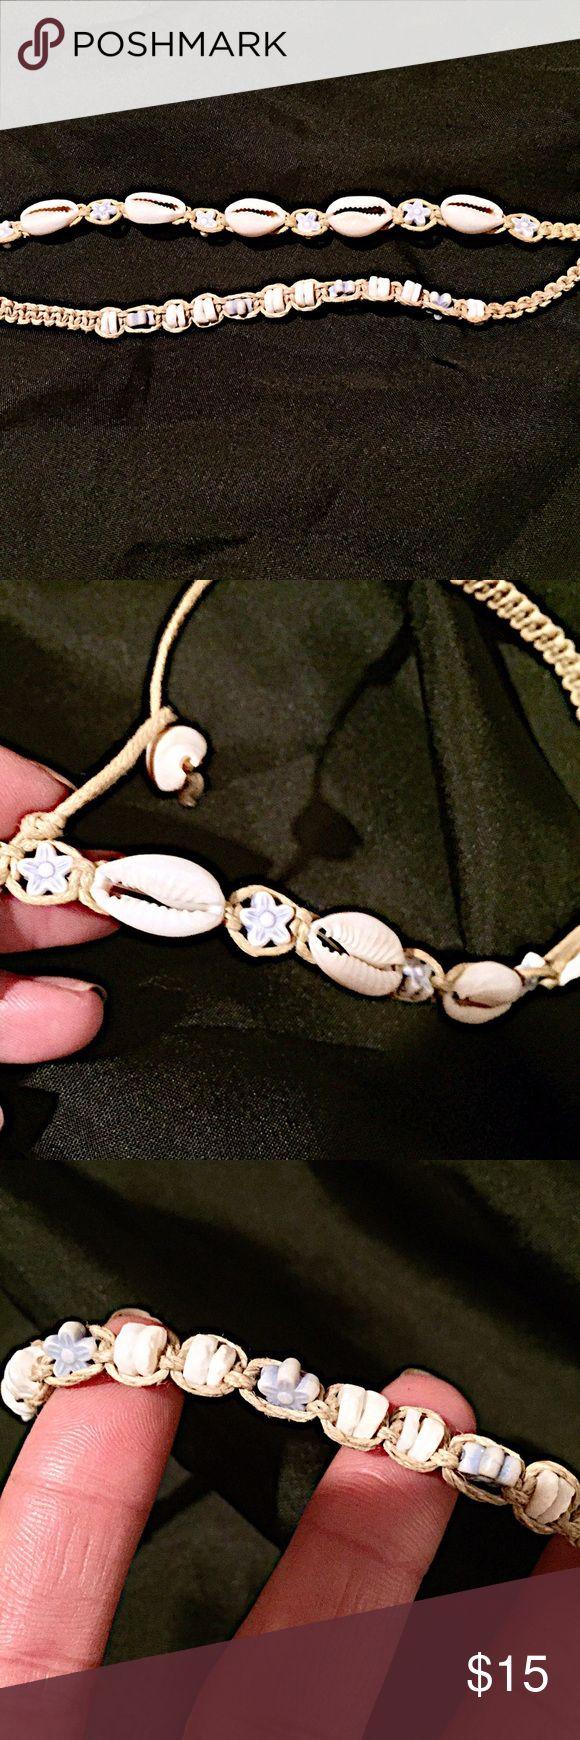 🔆NWOT Seashell Choker and Bracelet🔆 NWOT braided seashell choker and bracelet. With light blue flower beads. Jewelry